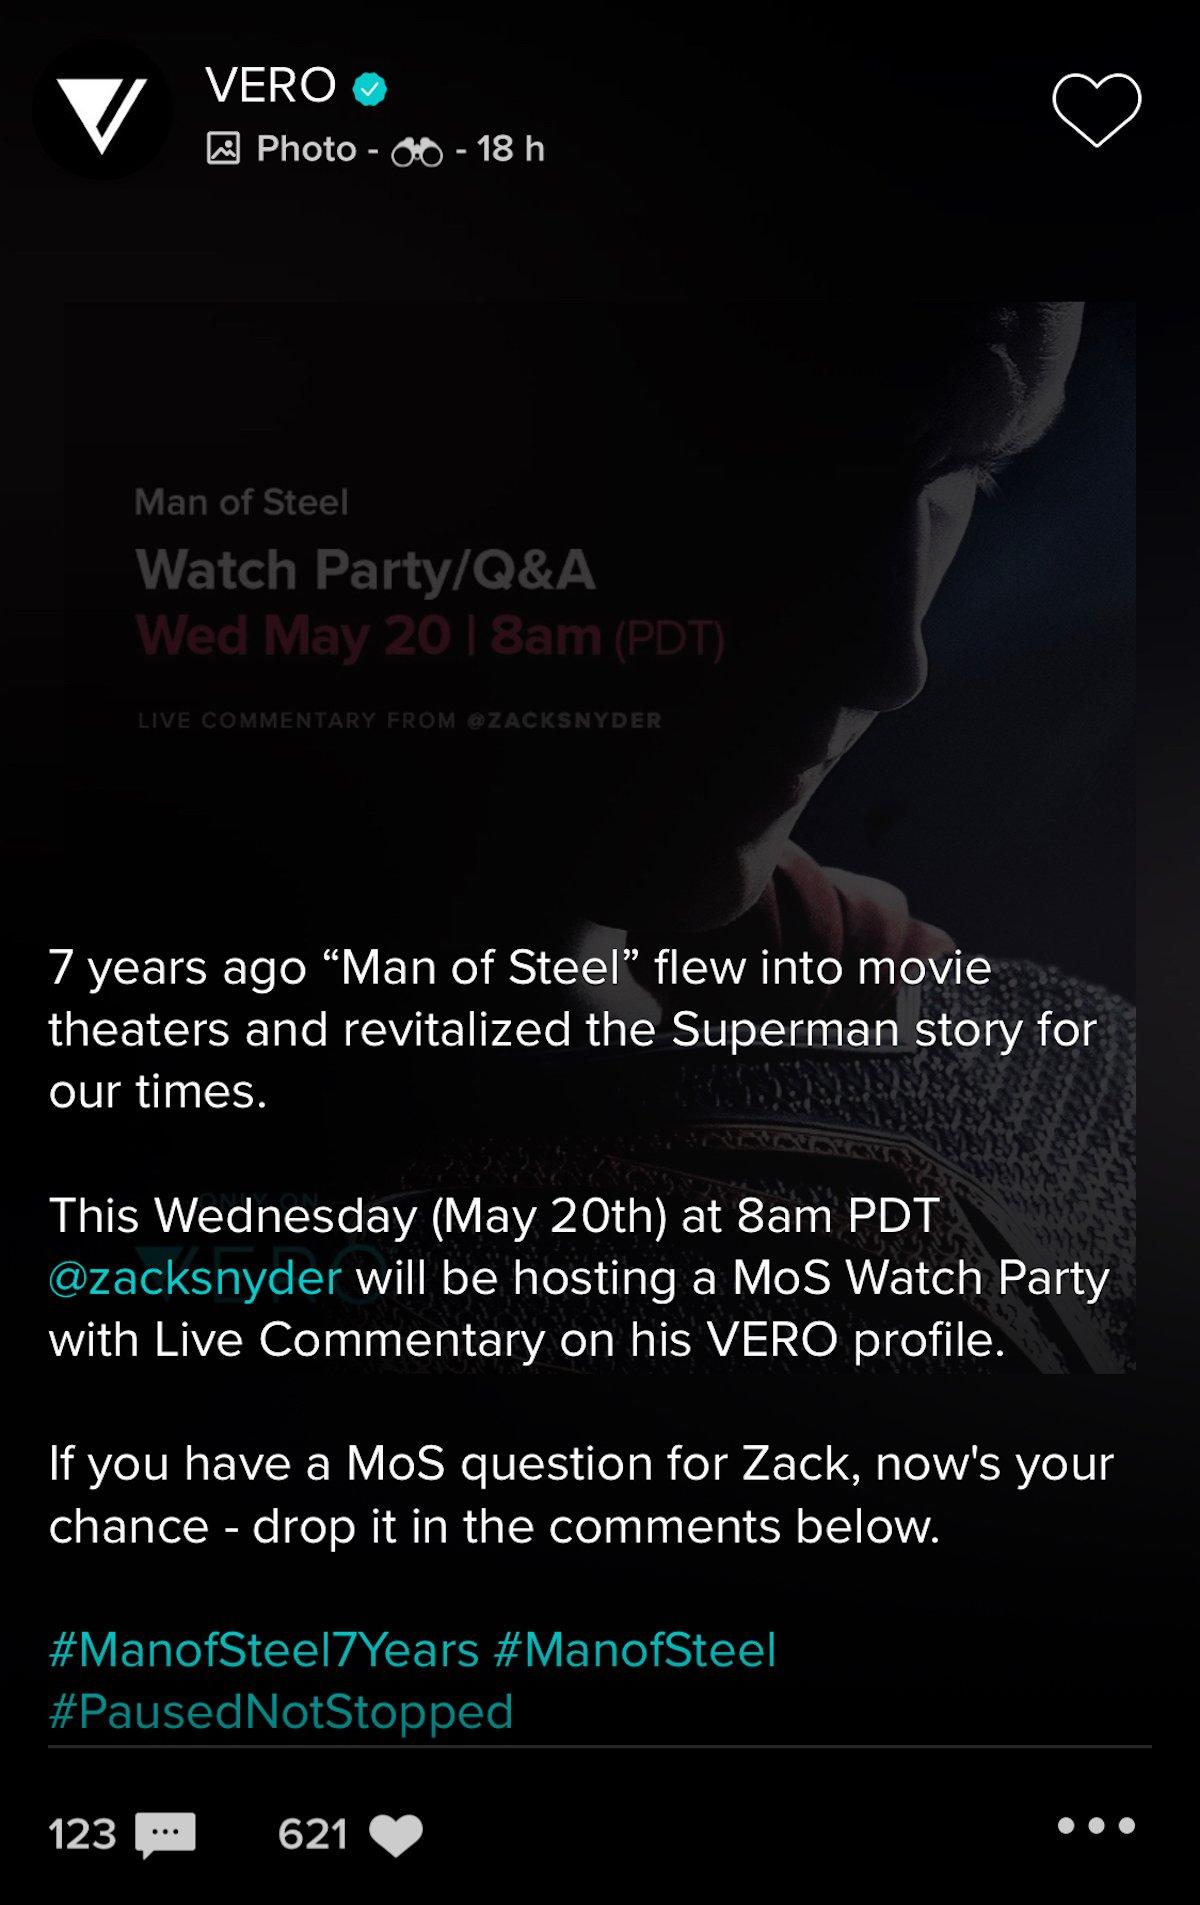 Man of Steel announcement